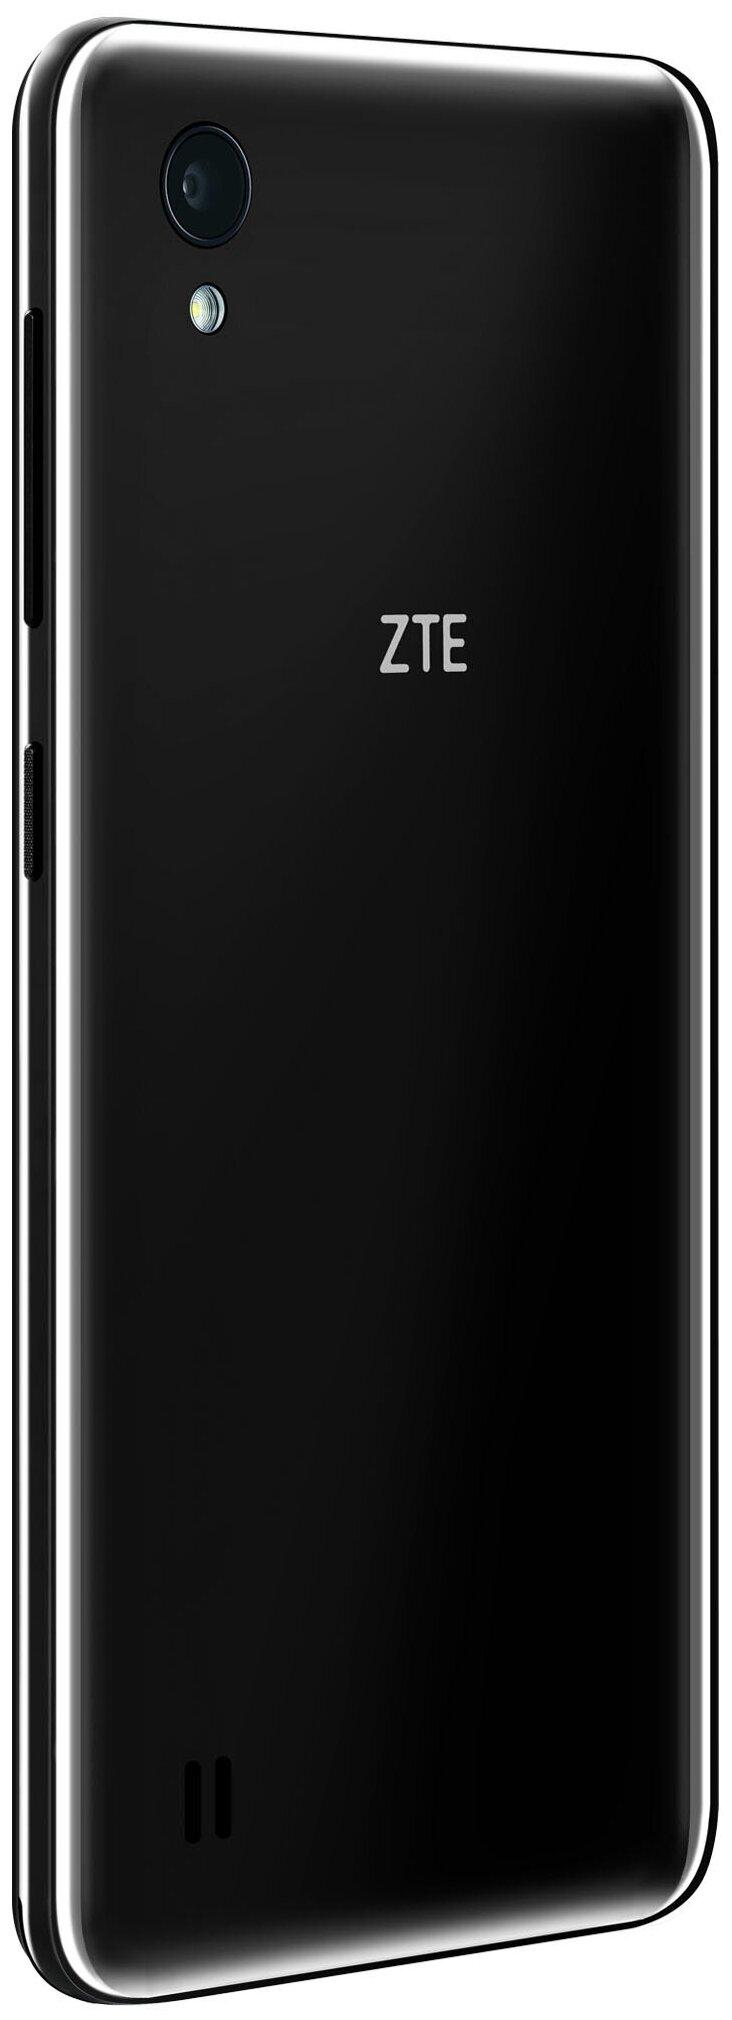 ZTE Blade A5 (2019) 2/32GB - камера: 13МП